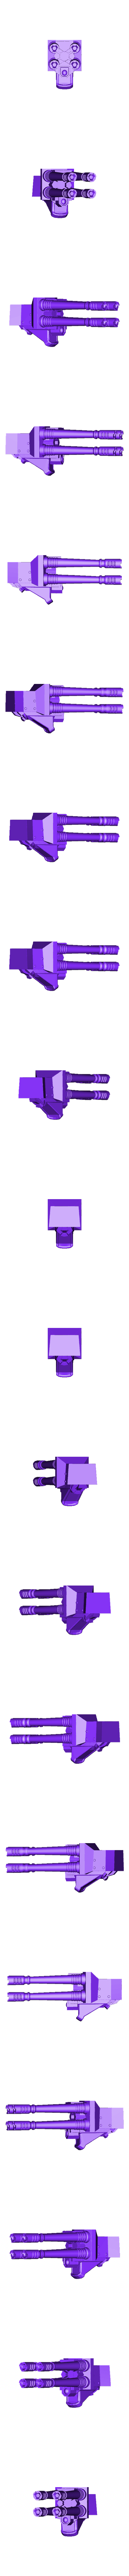 Weapon_02.stl Download STL file ARMED BUNKERS • 3D printer template, Txarli_Factory